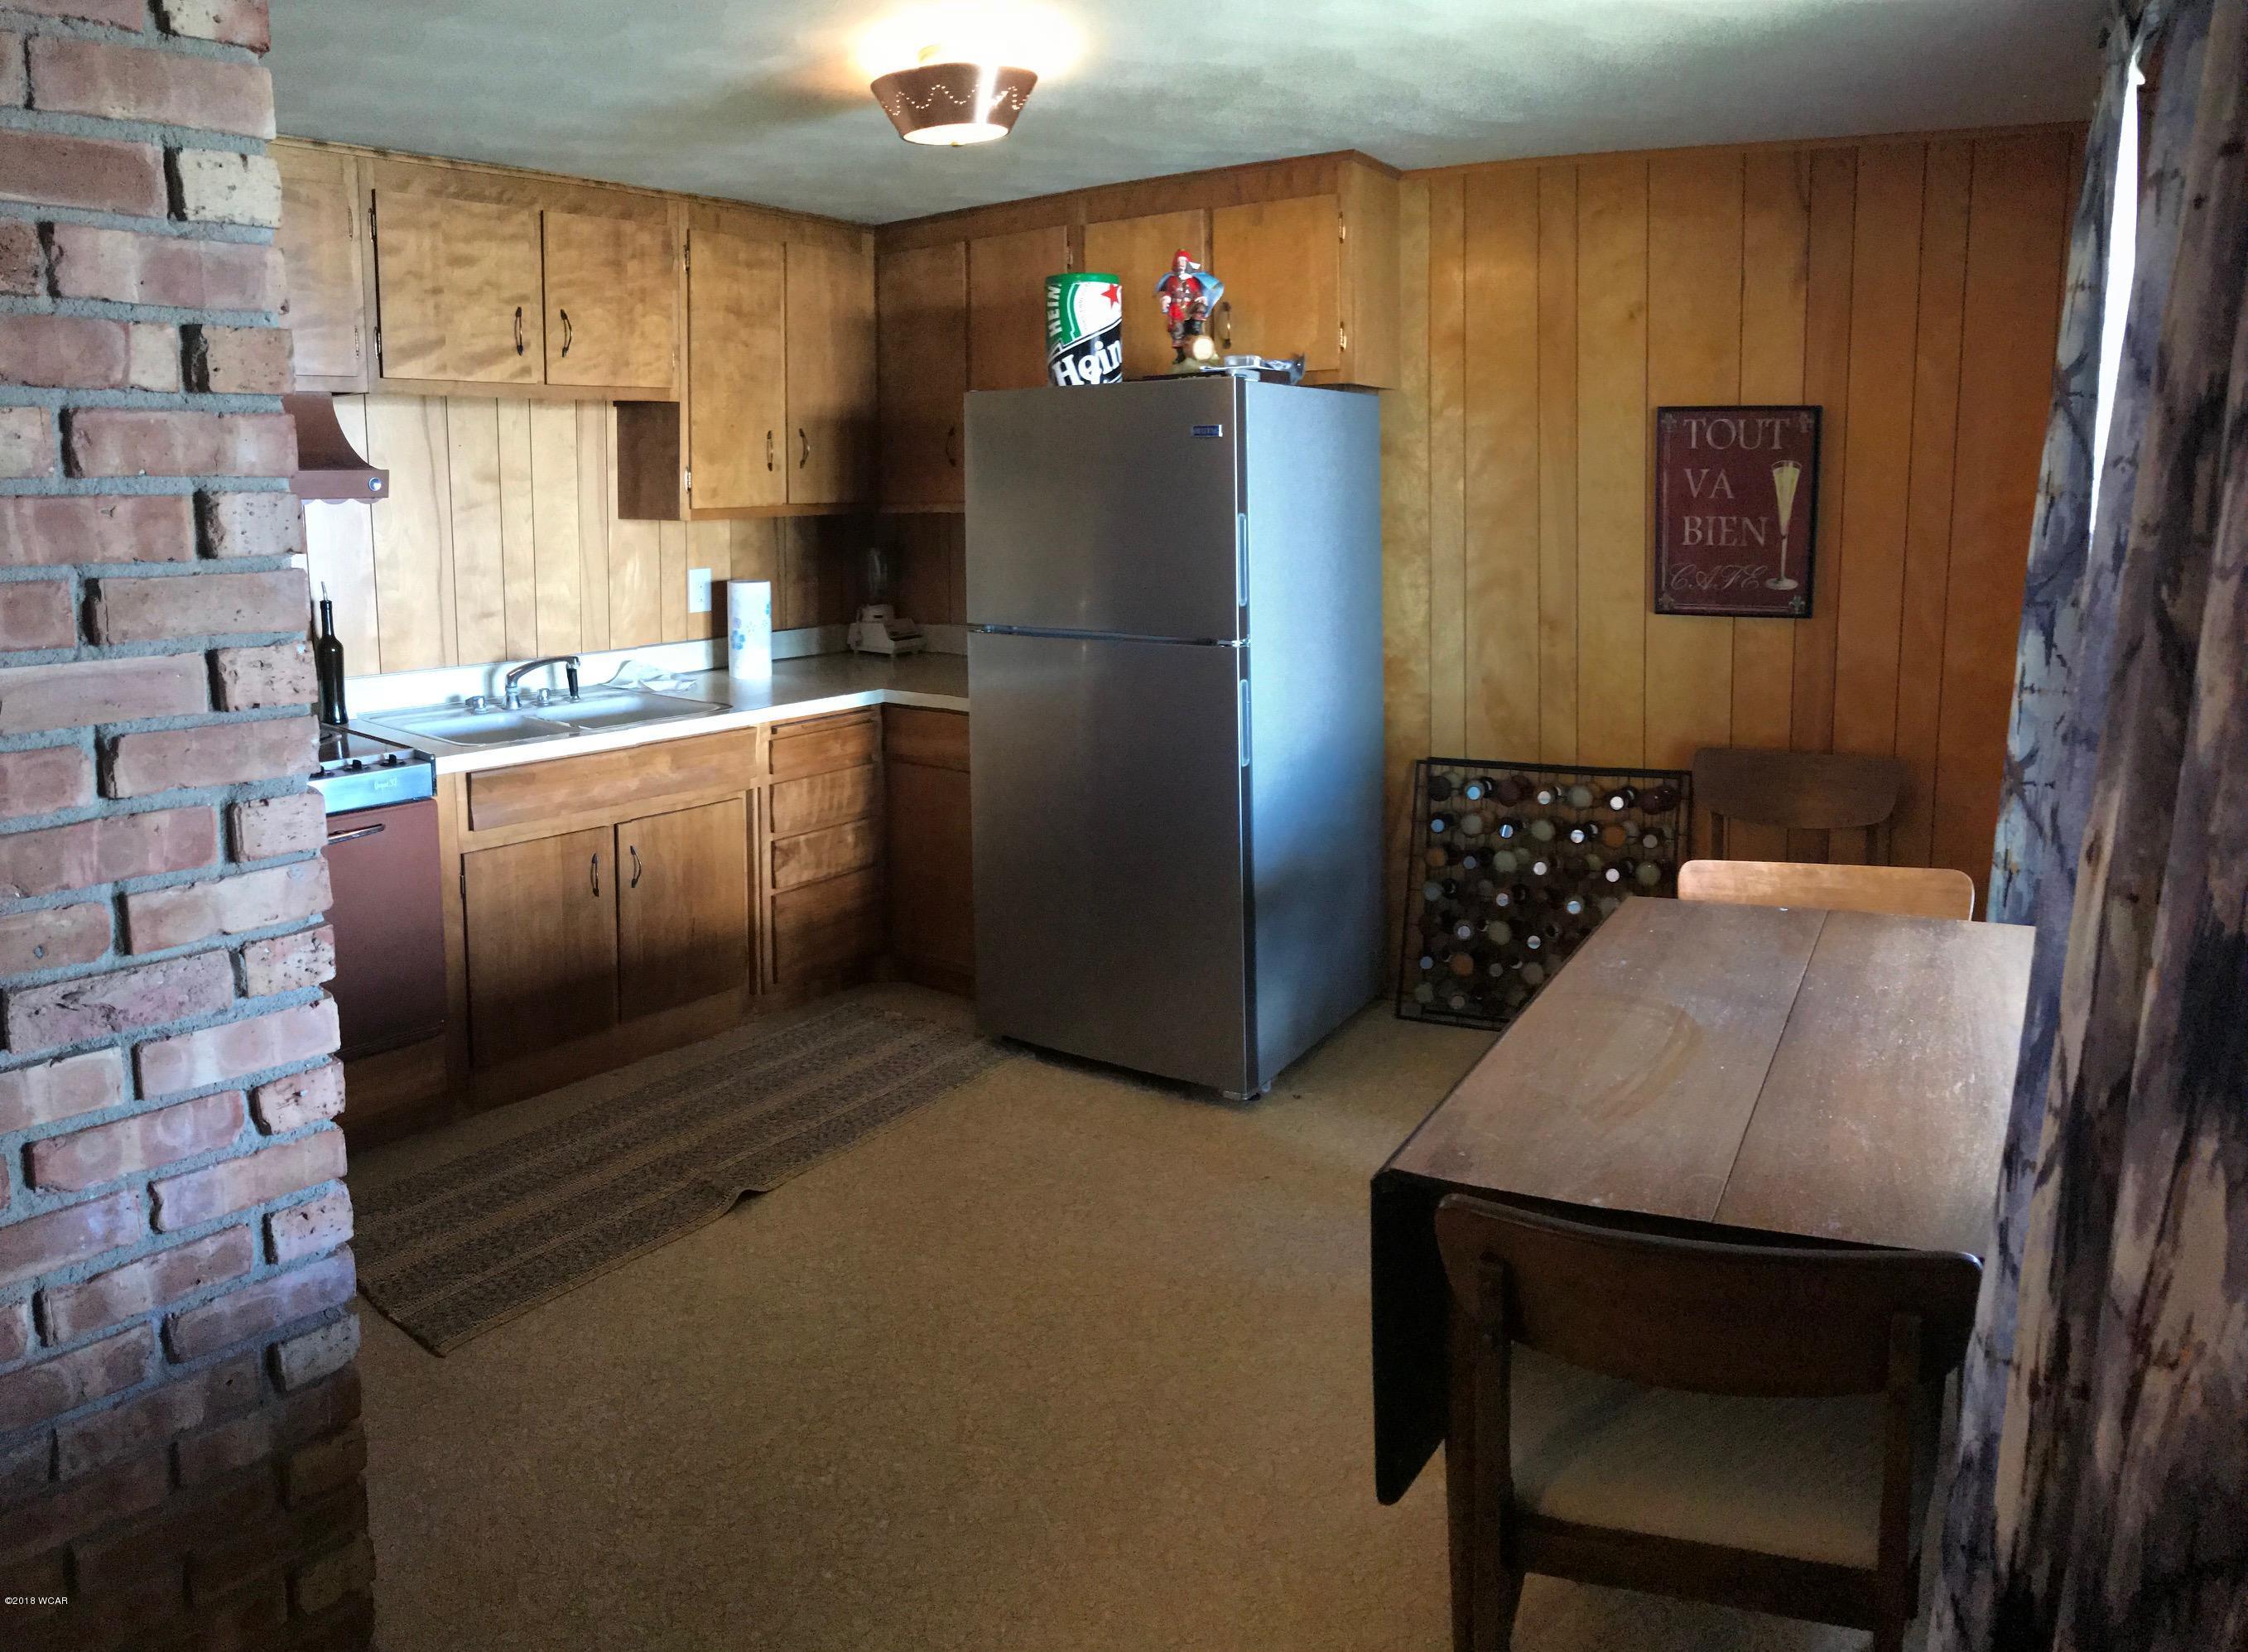 9335 N Shore Drive,Spicer,3 Bedrooms Bedrooms,2 BathroomsBathrooms,Single Family,N Shore Drive,6032471